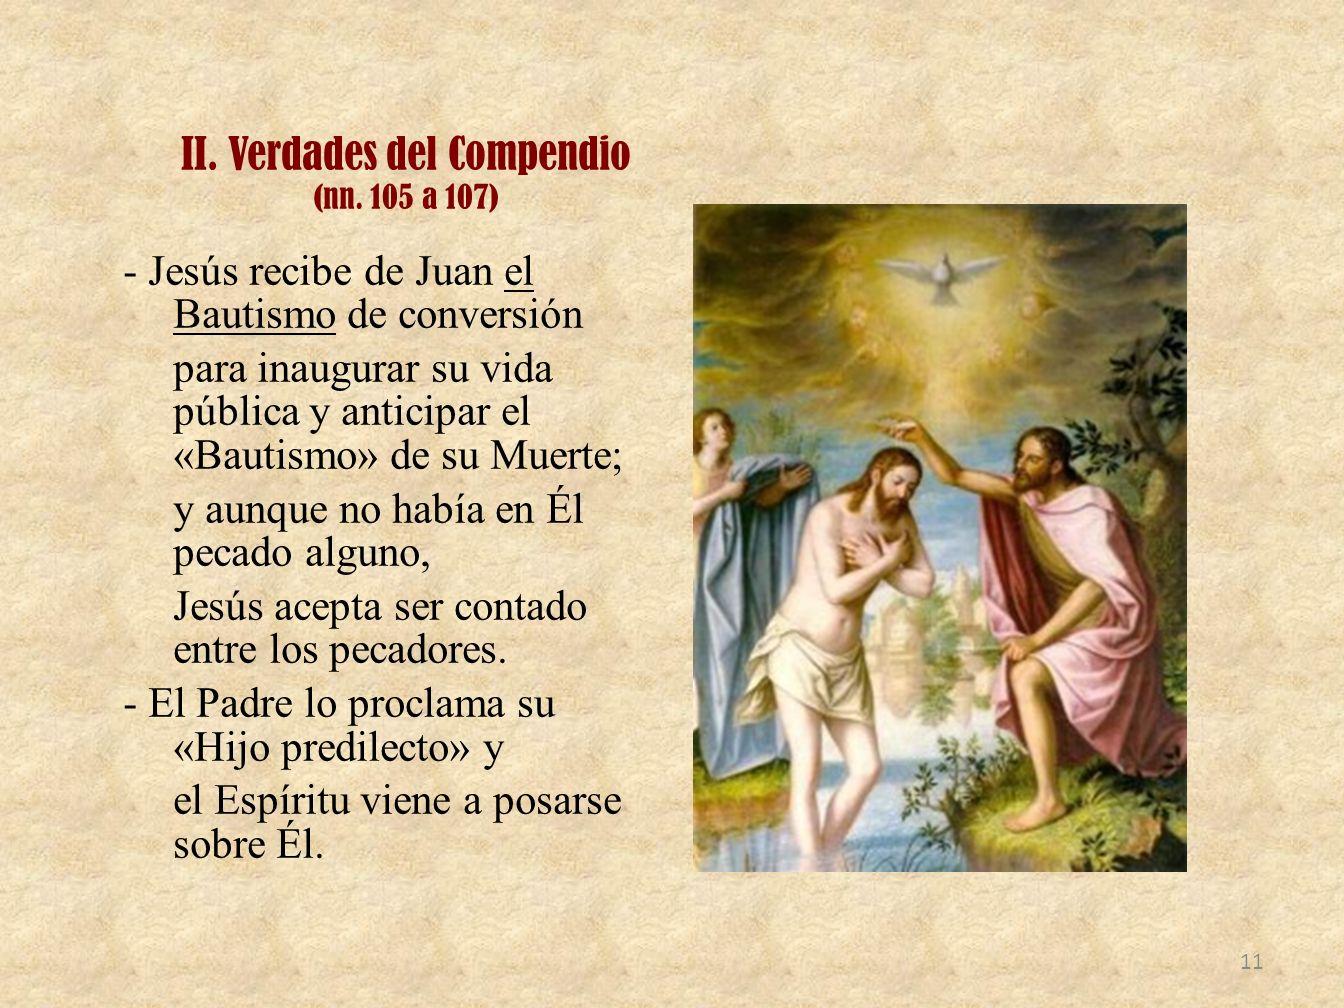 II. Verdades del Compendio (nn. 105 a 107)